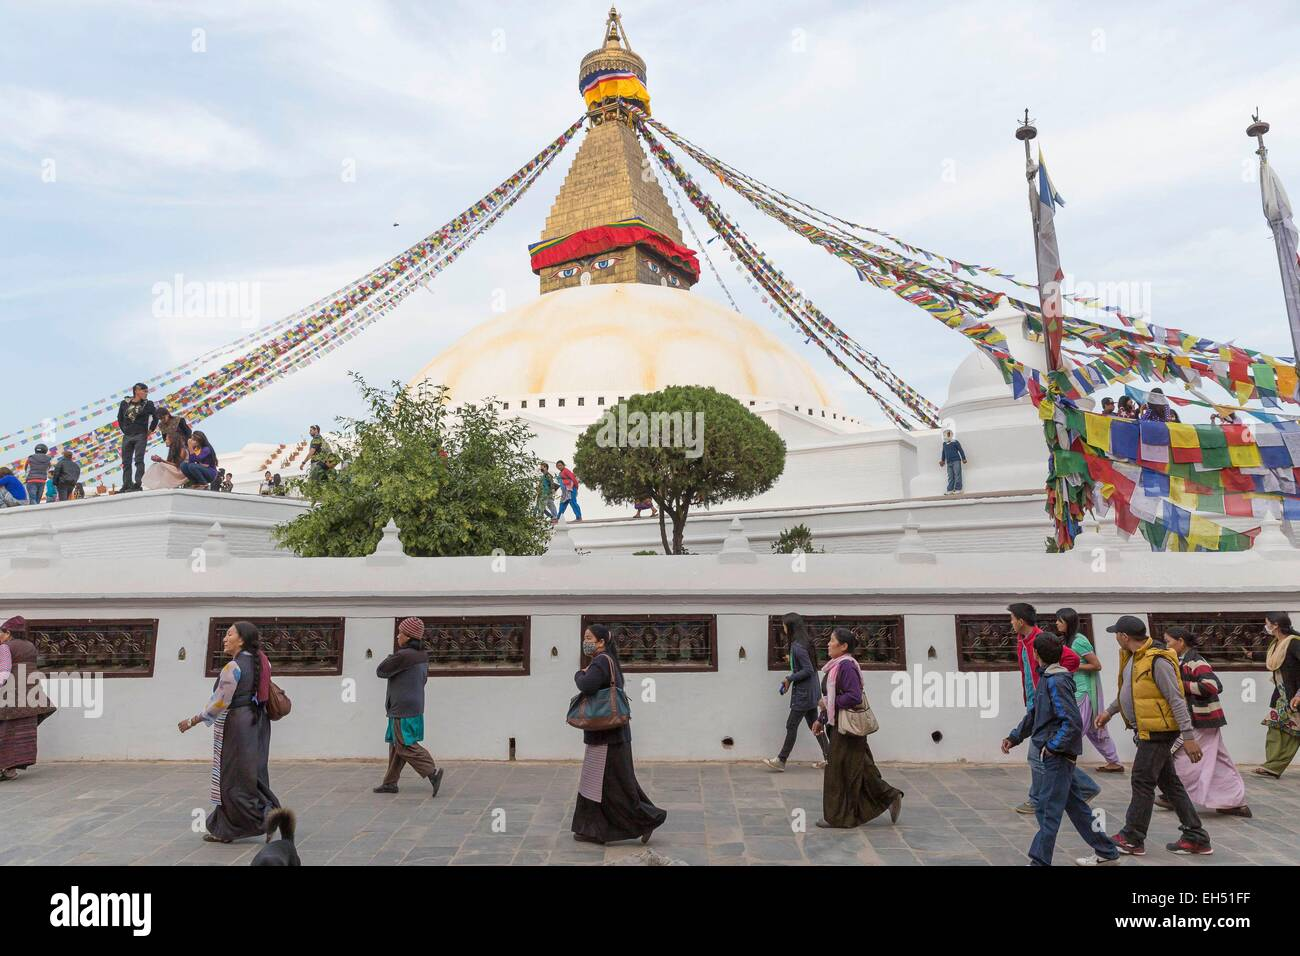 Nepal, Kathmandu, Bodhnath, listed as World Heritage by UNESCO, the largest stupa in Asia - Stock Image